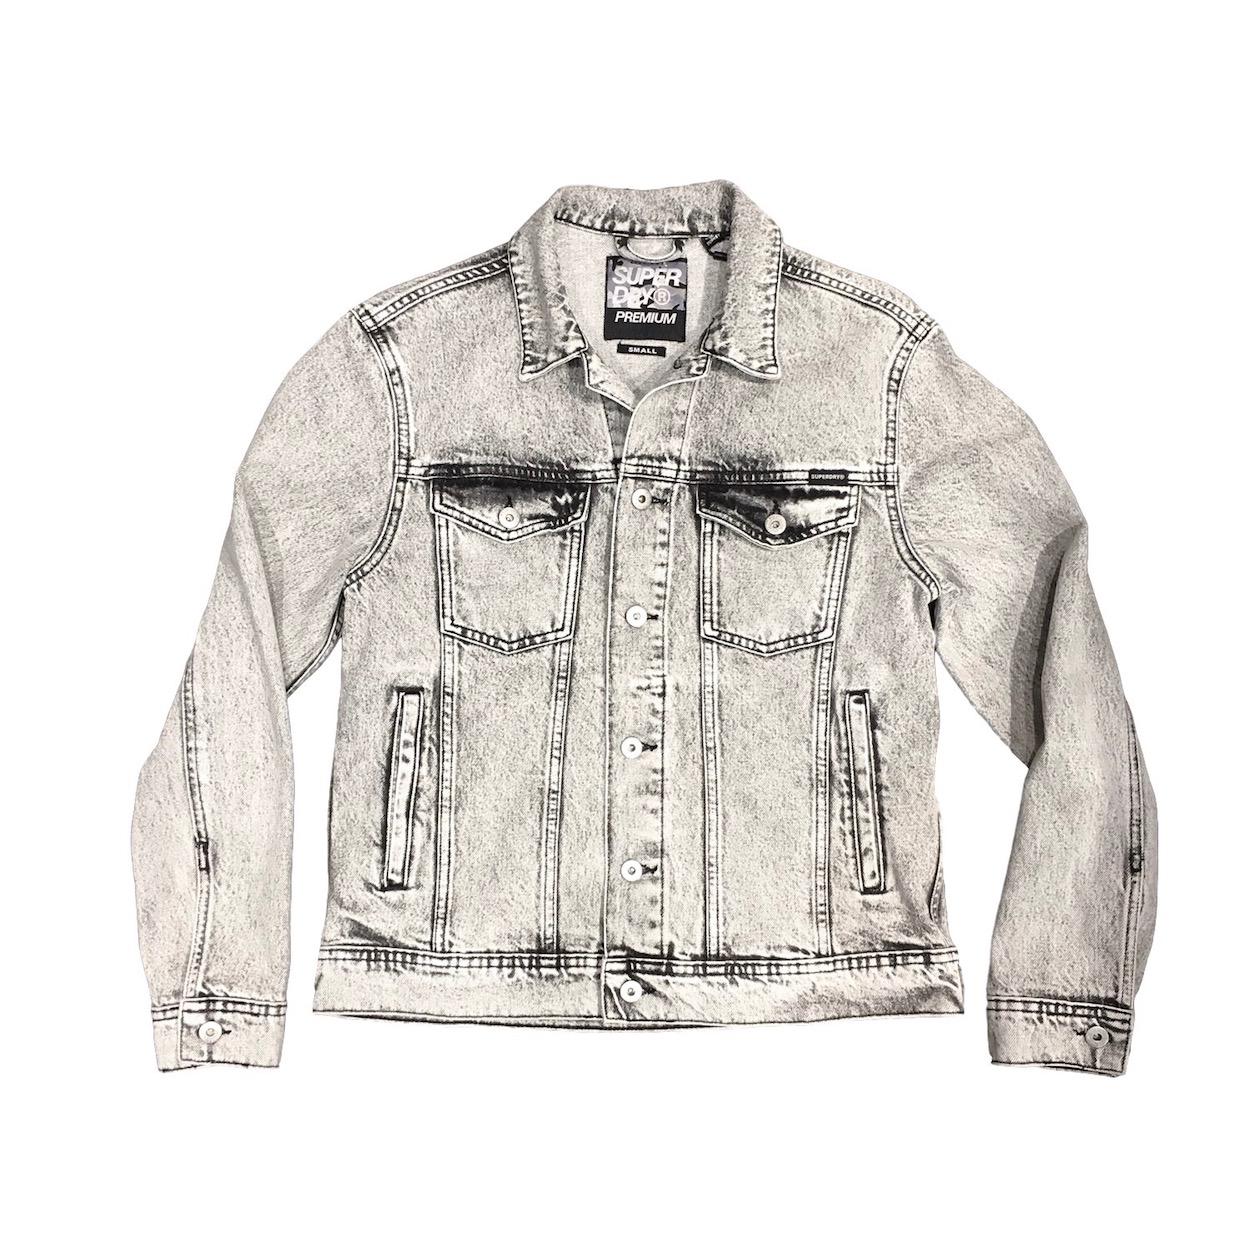 Superdry Highwayman Trucker Jacket